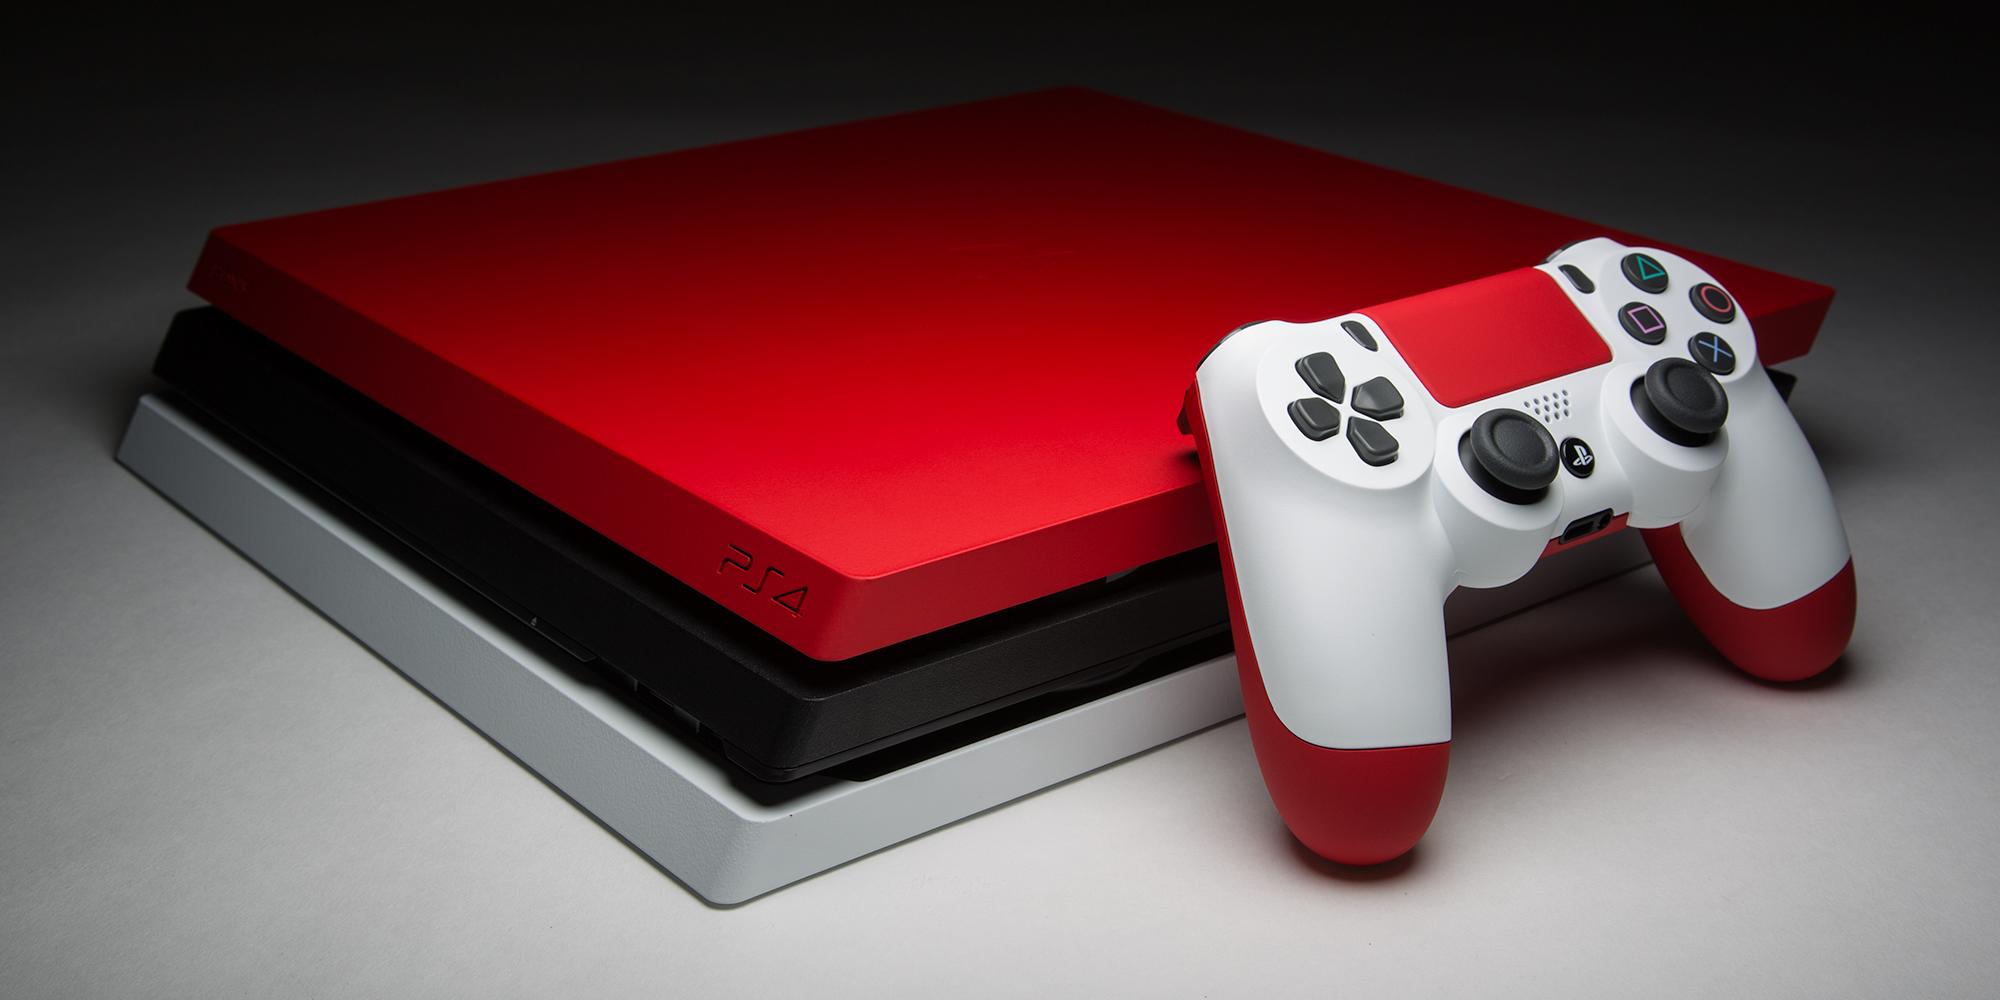 PlayStation 4 Pro | PlayStation 4 Custom | Colorware